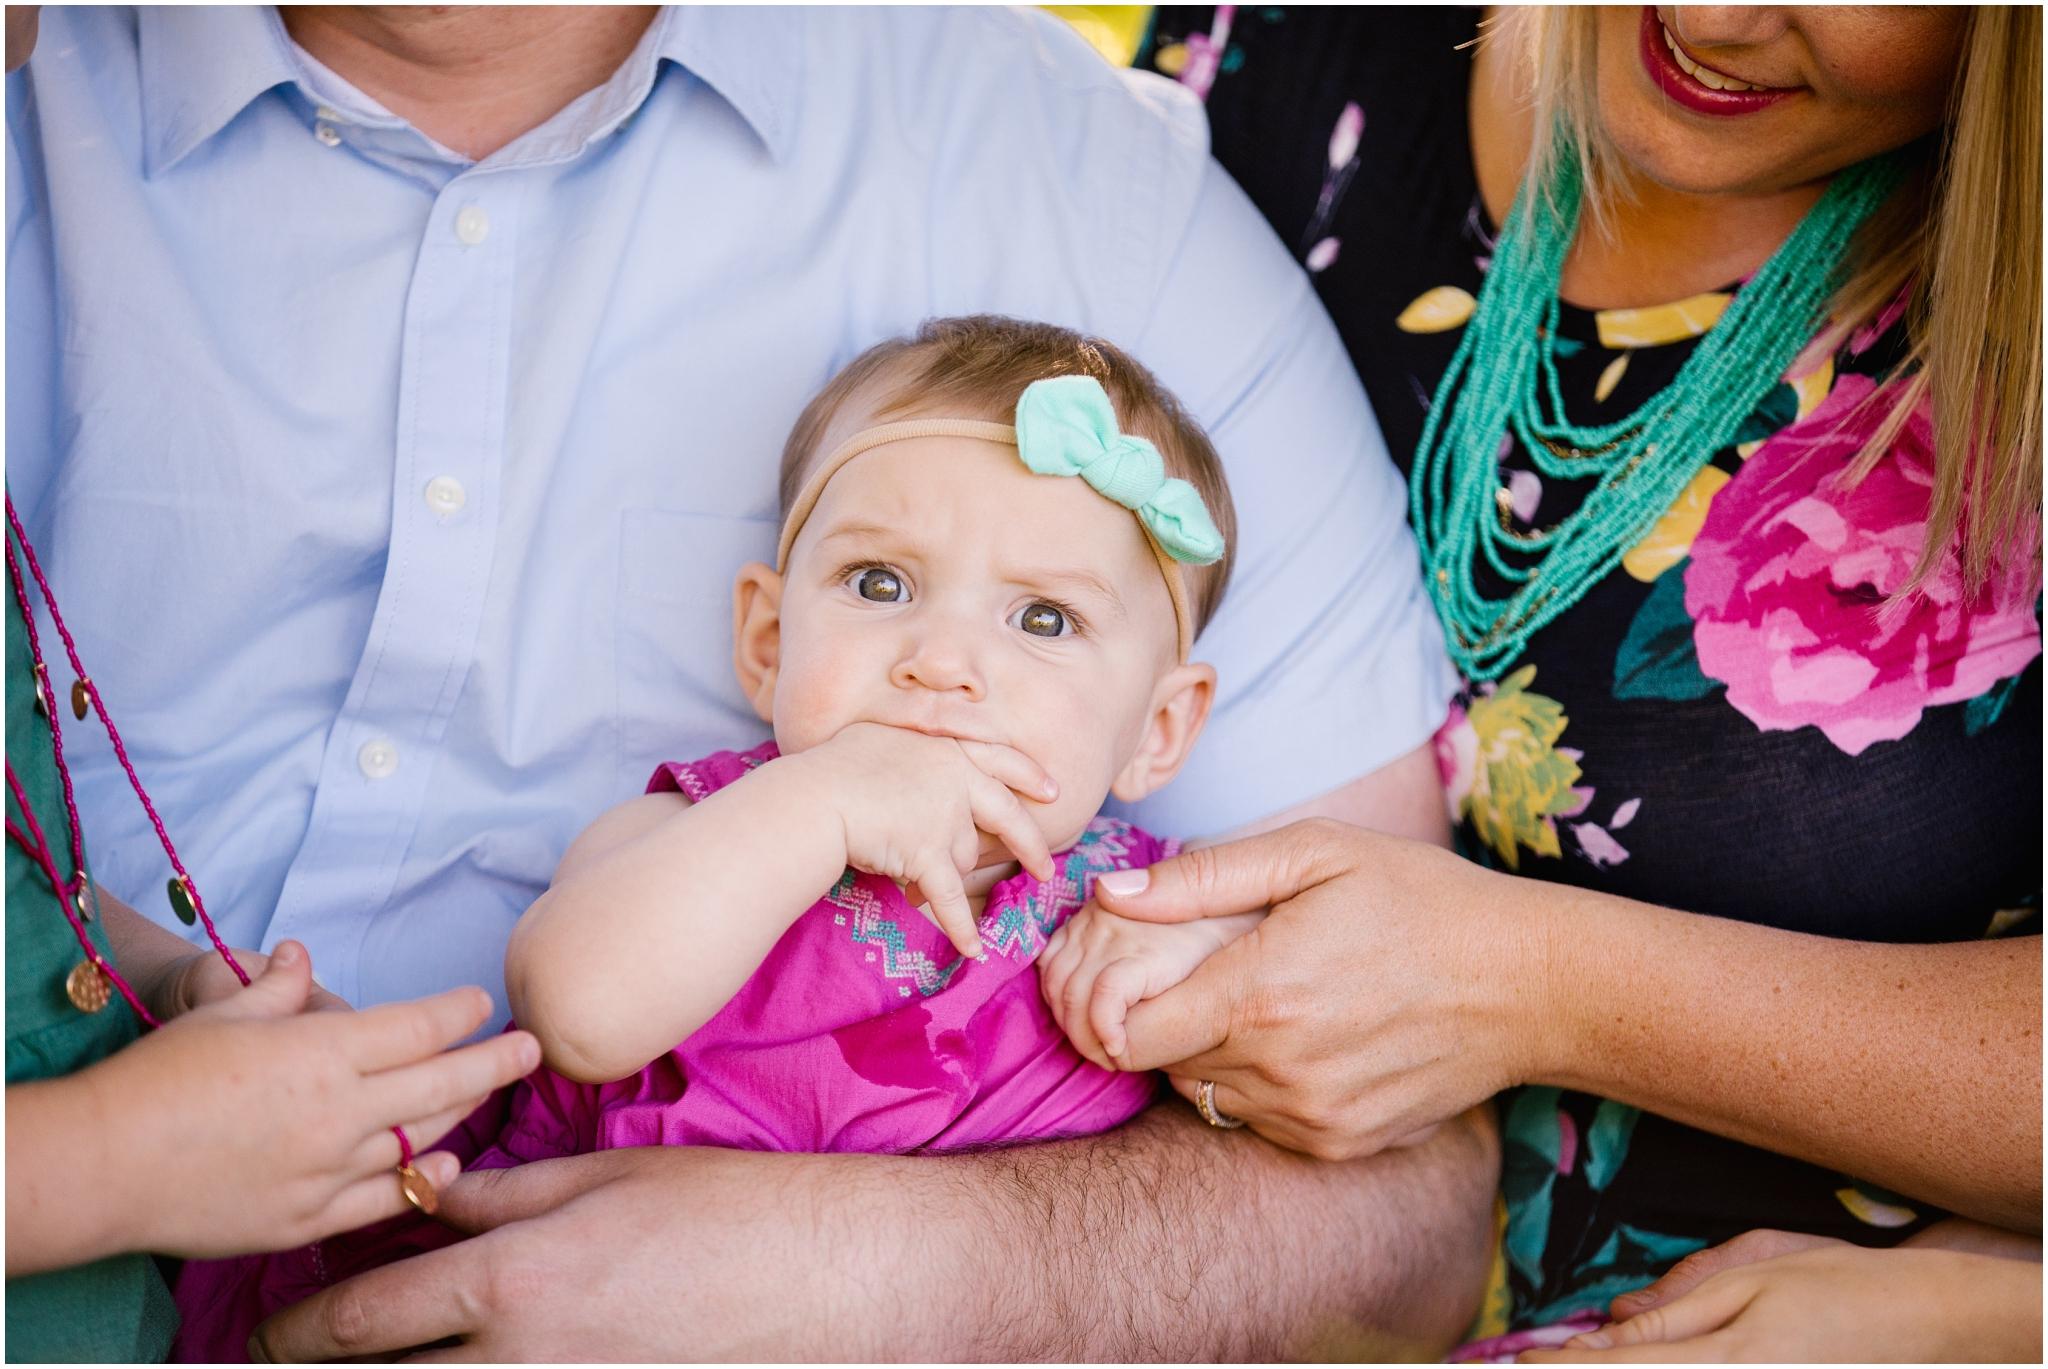 Lizzie-B-Imagery-Utah-Family-Photographer-Utah-County-Photographer-Hobble-Creek-Canyon_0007.jpg